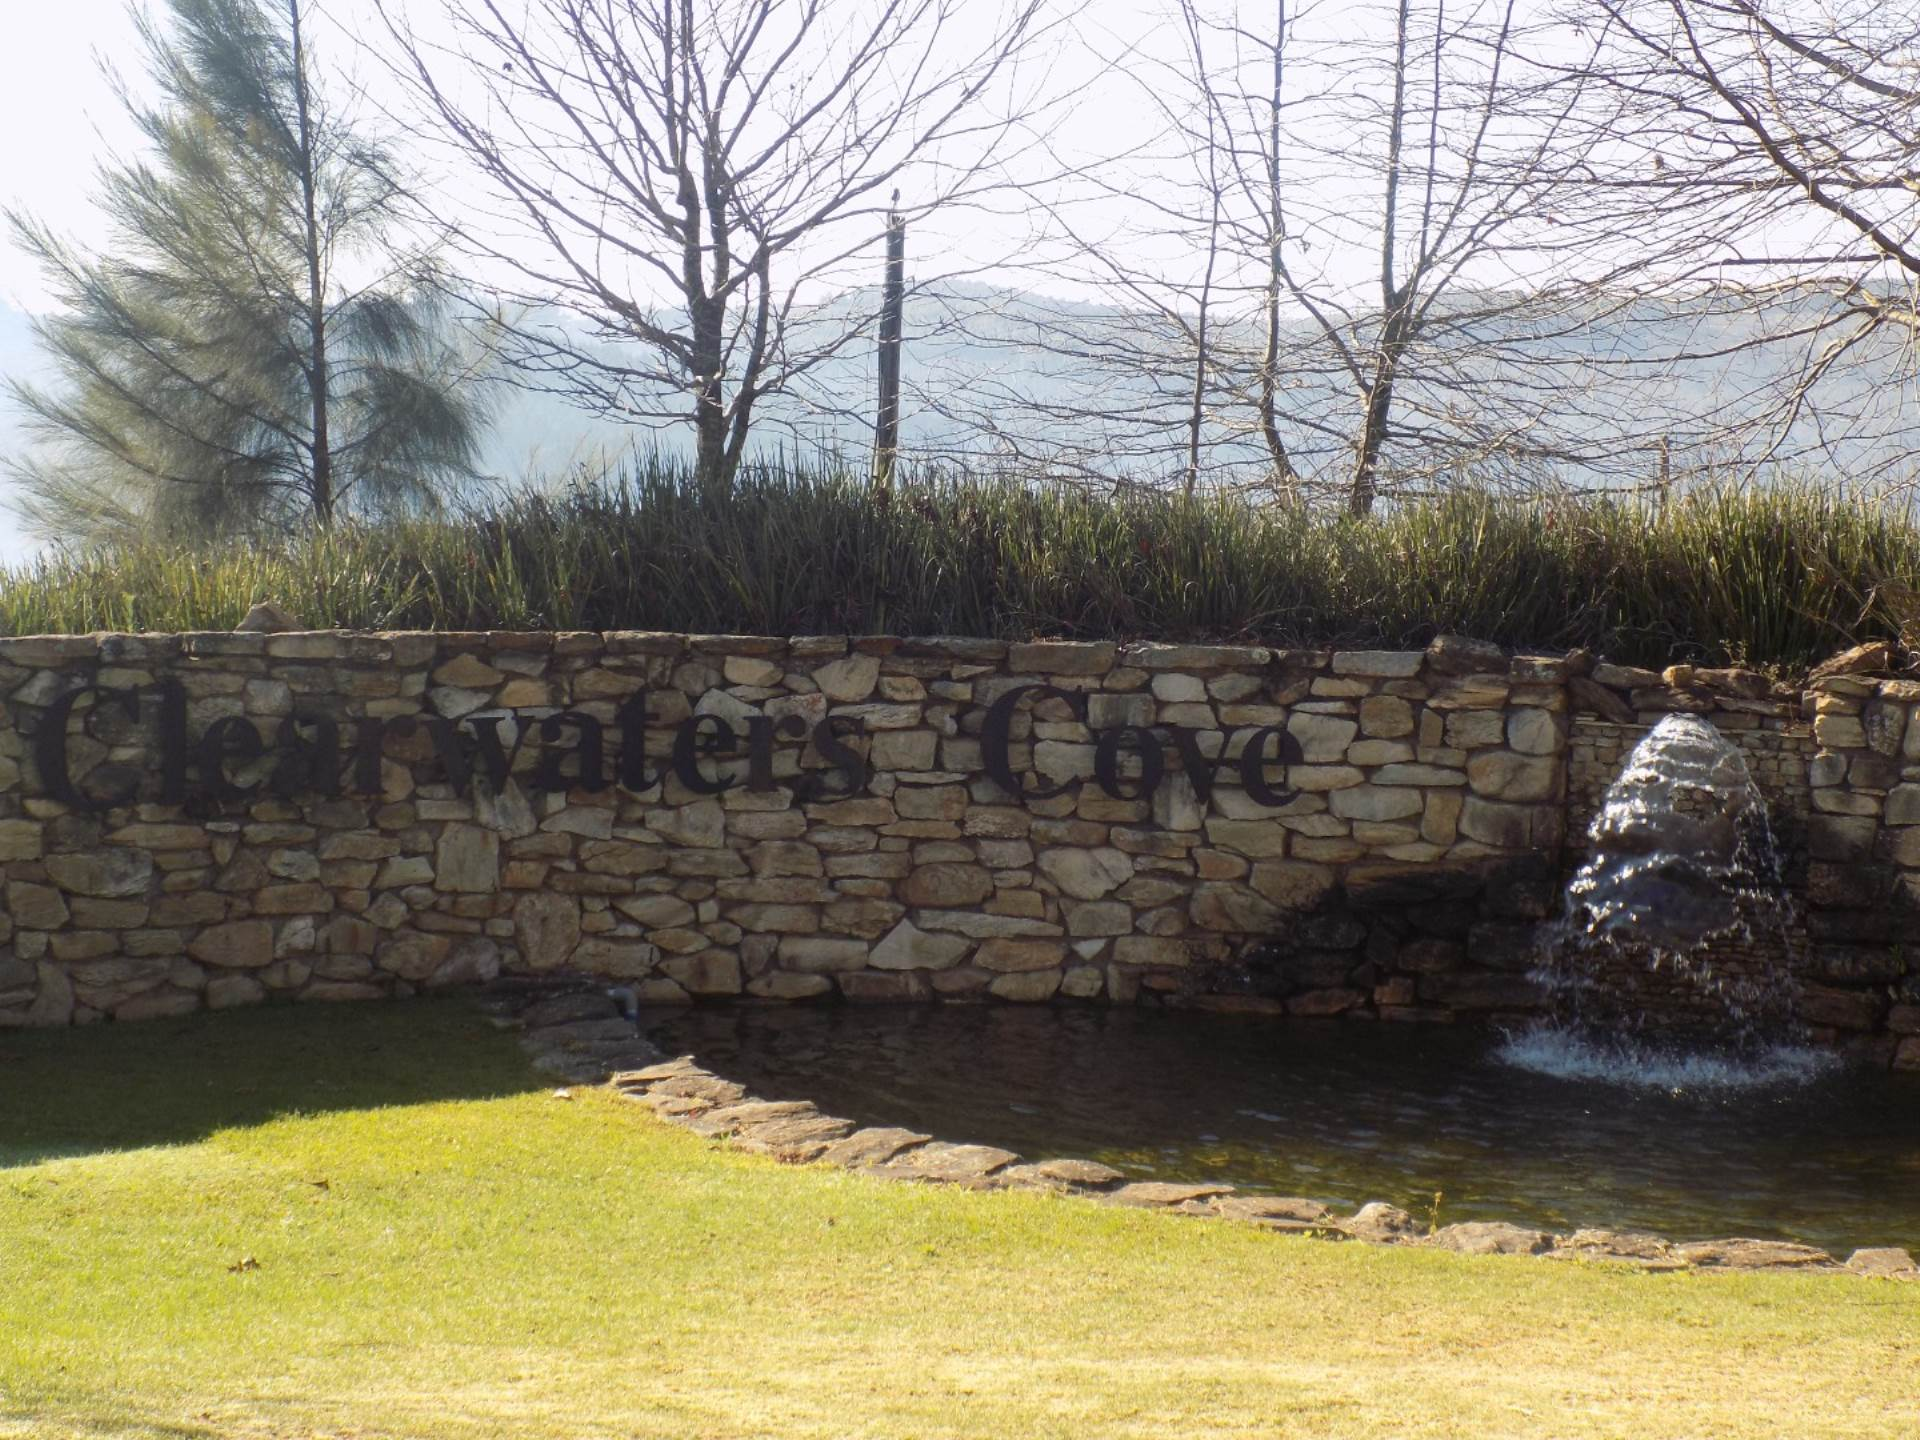 Vacant Land Residential Pending Sale In Haenertsburg